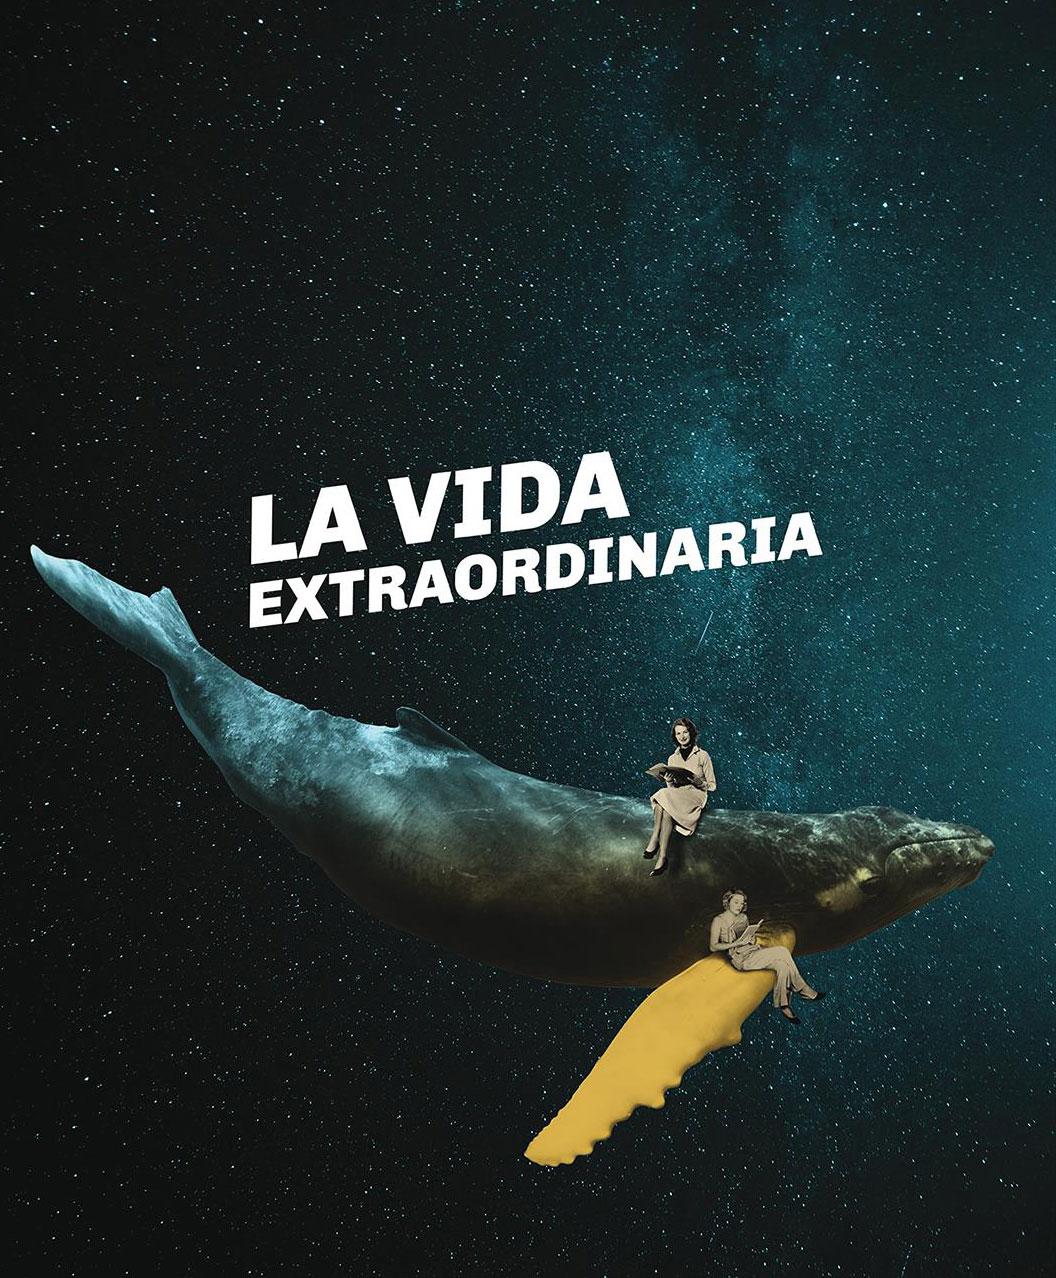 LA VIDA EXTRAORDINARIA